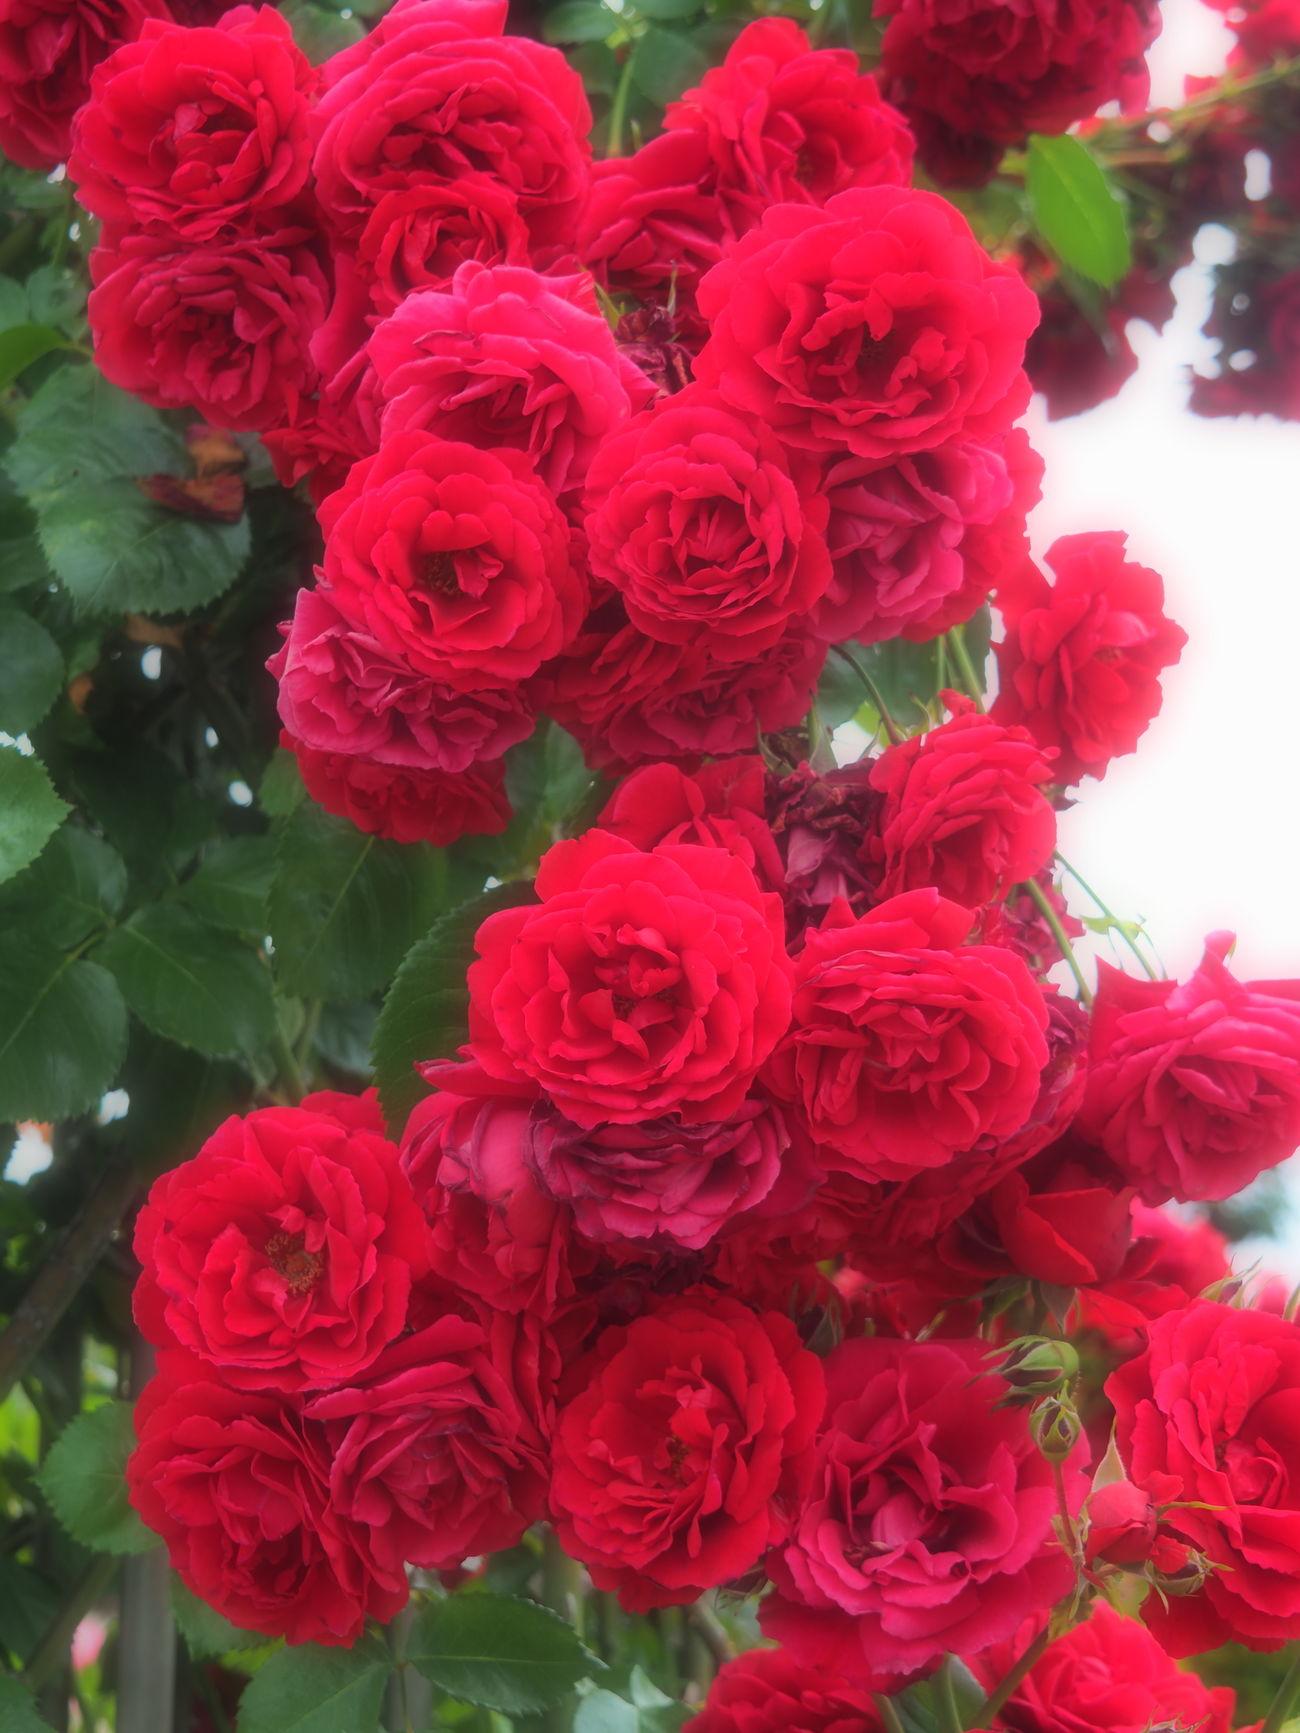 EyeEmFlower Goodmorning Goodmorning :) Goodmorning EyeEm  Goodmorning ♥ GoodMorning⛅ Hello Hello EyeEm Hello Word ✌ Hello World Hello World ✌ Hello World ❤ Hello World! Hello ❤ HelloEyeEm Helloworld Red Flower Red Roses RedFlower Rose - Flower Roses🌹 Rose♥ Rose🌹